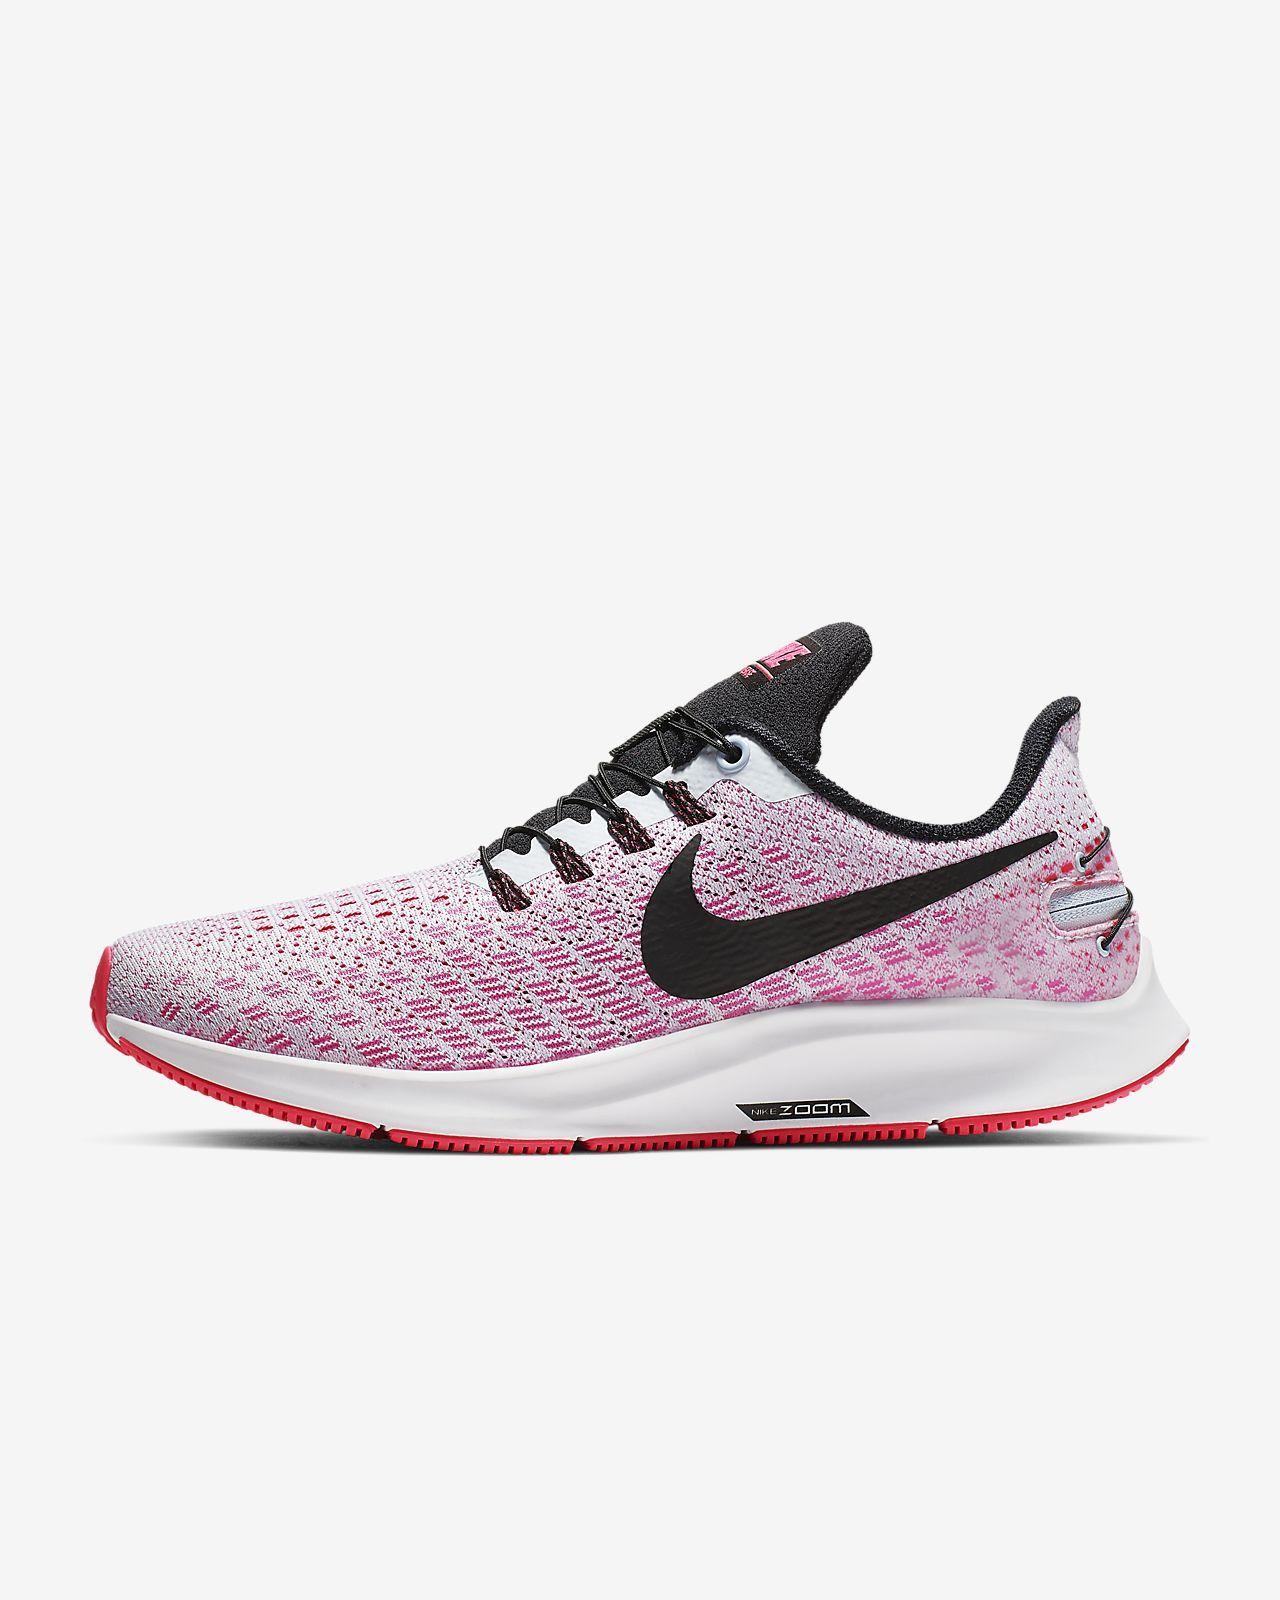 Nike Air Zoom Pegasus 35 FlyEase Women